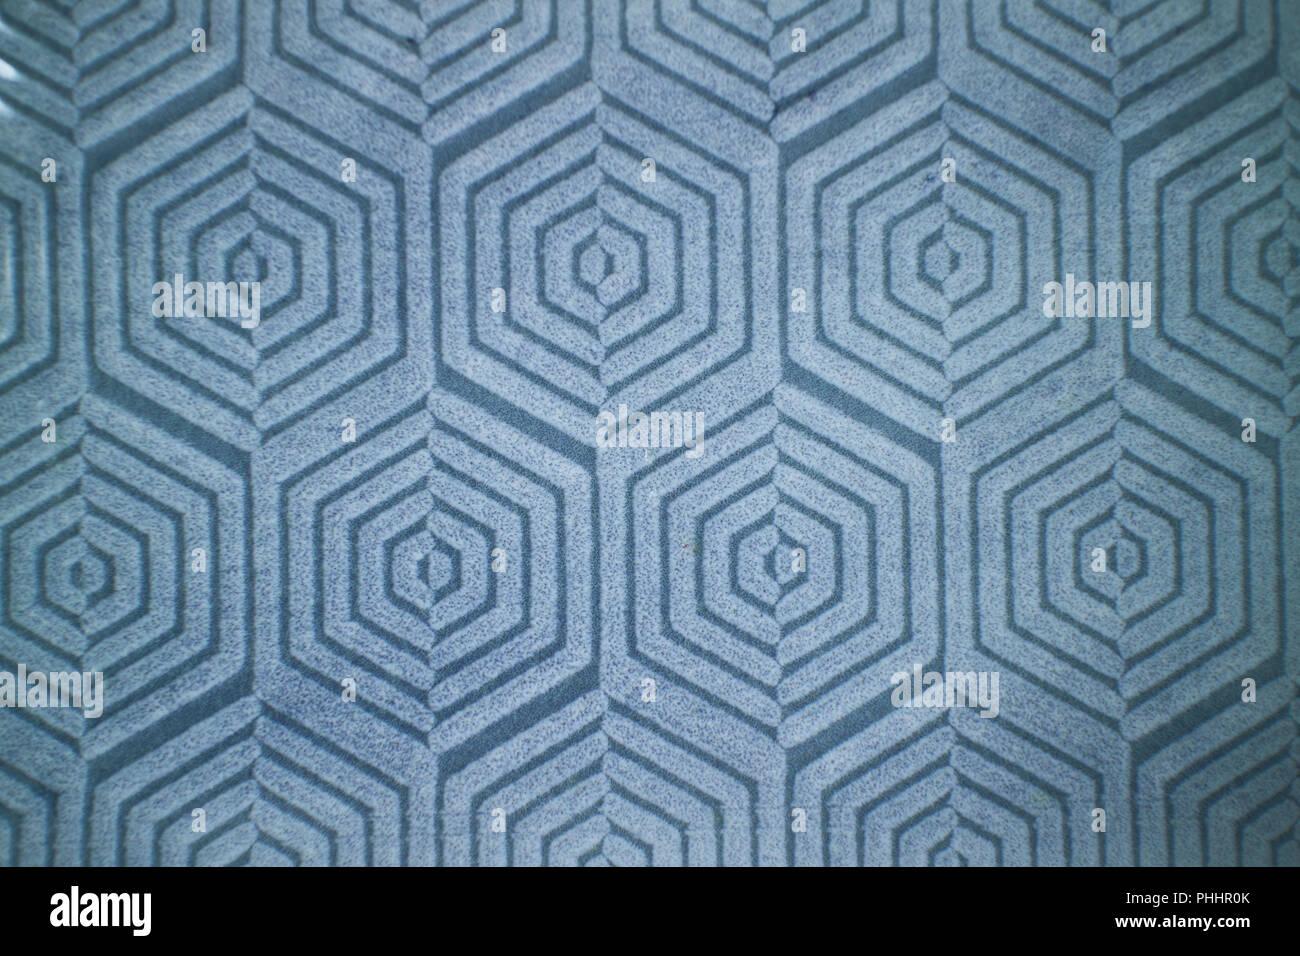 Blue Ceramic Tiles Stock Photos & Blue Ceramic Tiles Stock Images ...